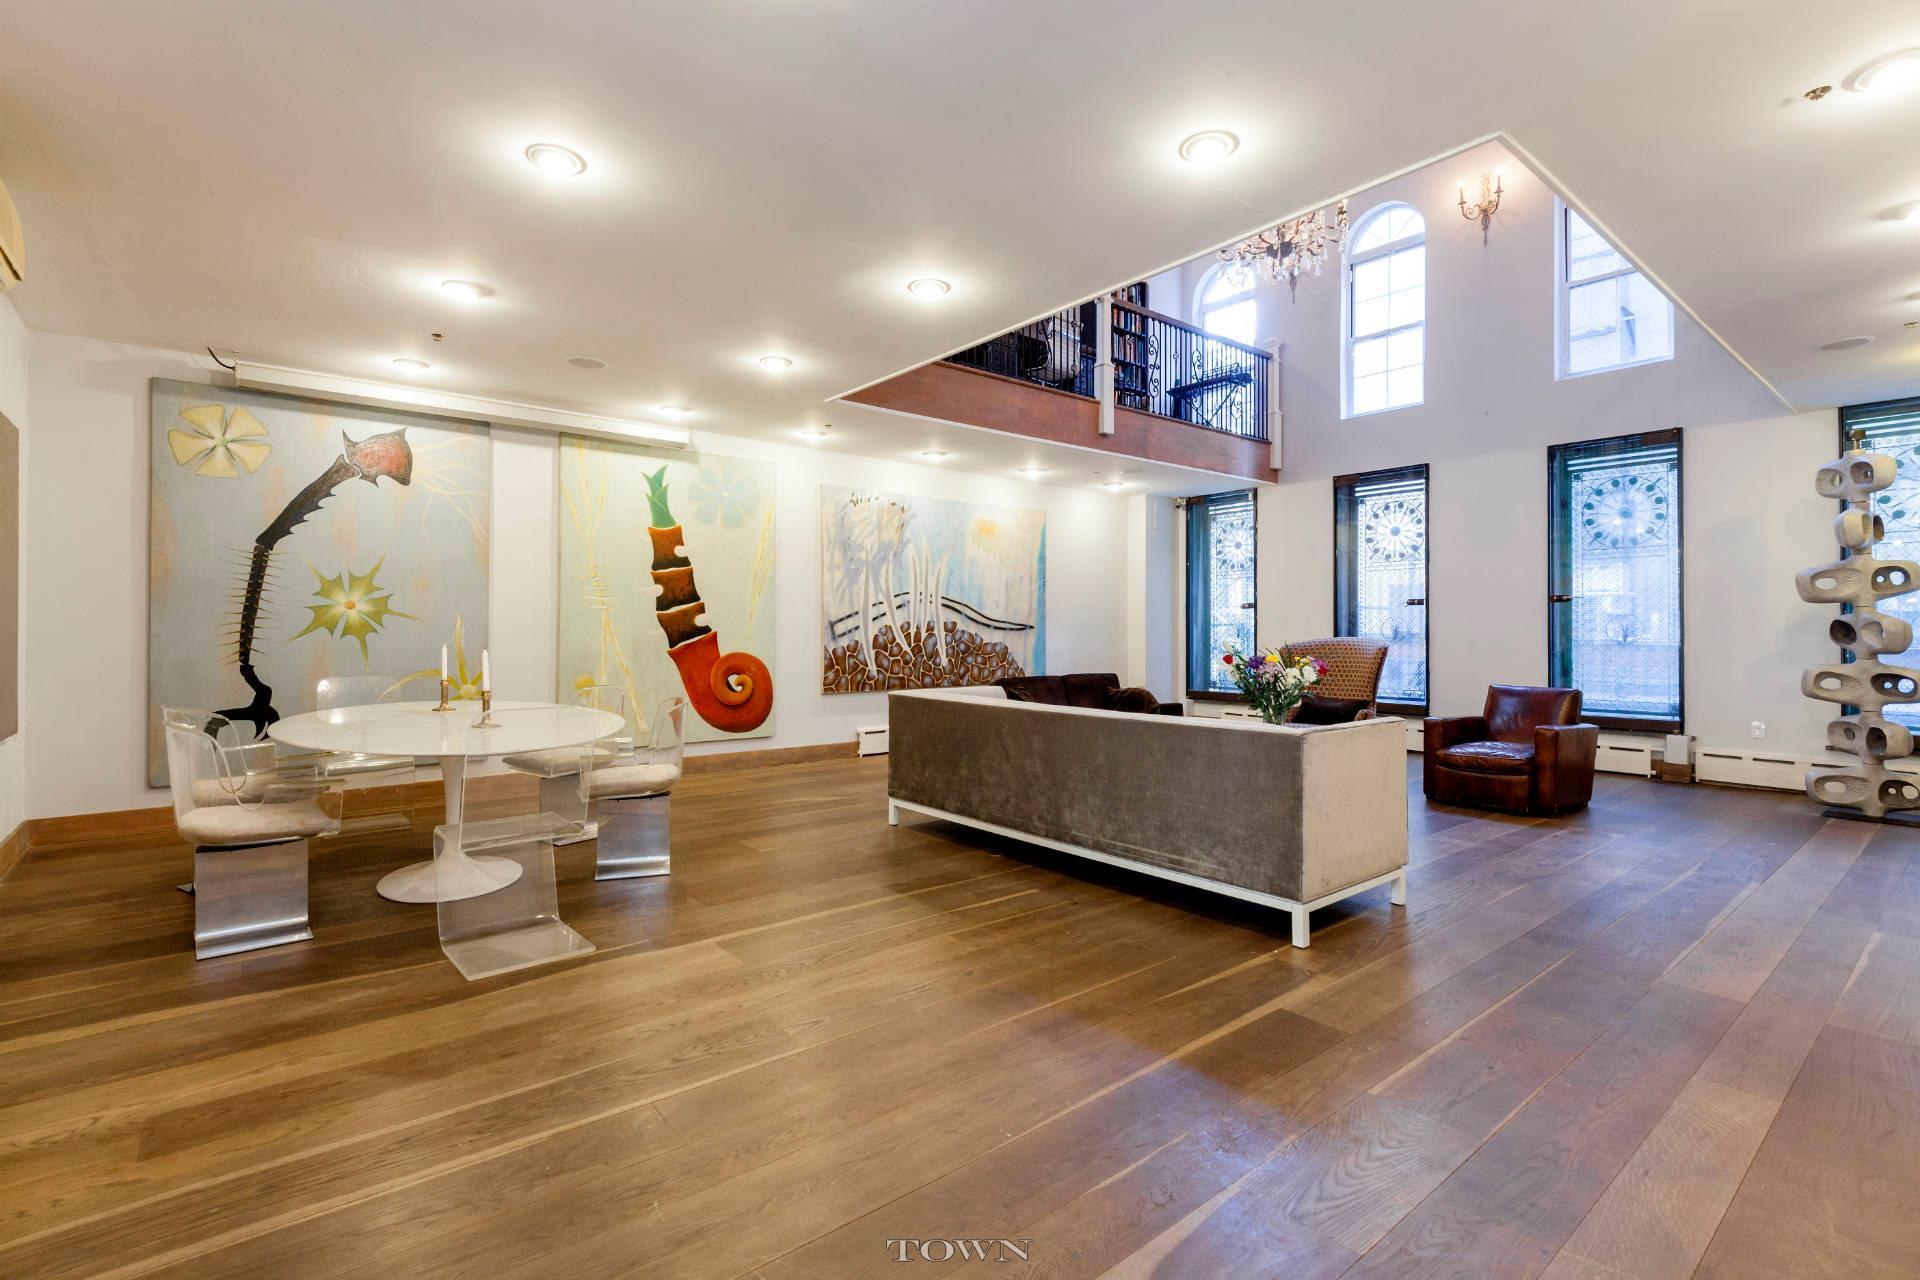 12 Avenue A, duplex, rental, east village, dining room